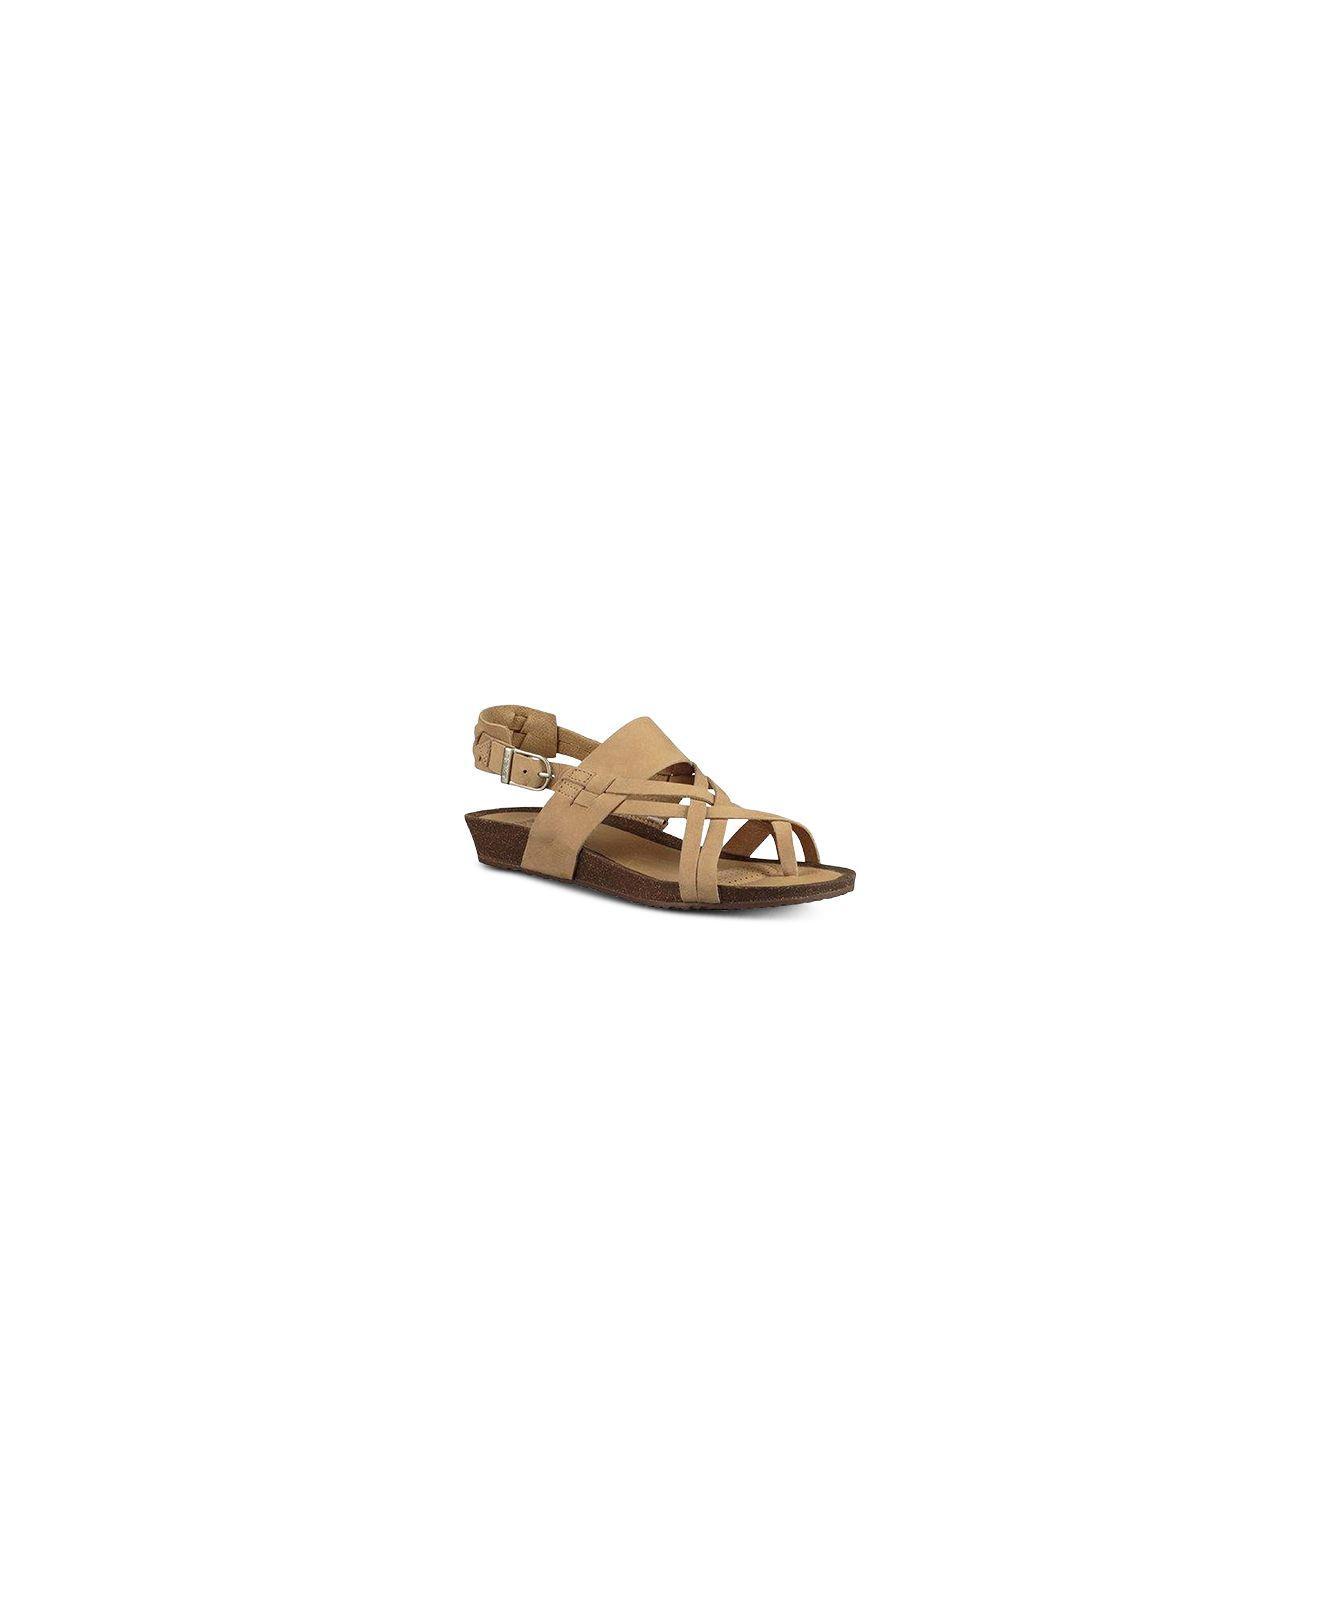 eda0fffaf Teva. Women s Ysidro Extension Sandals